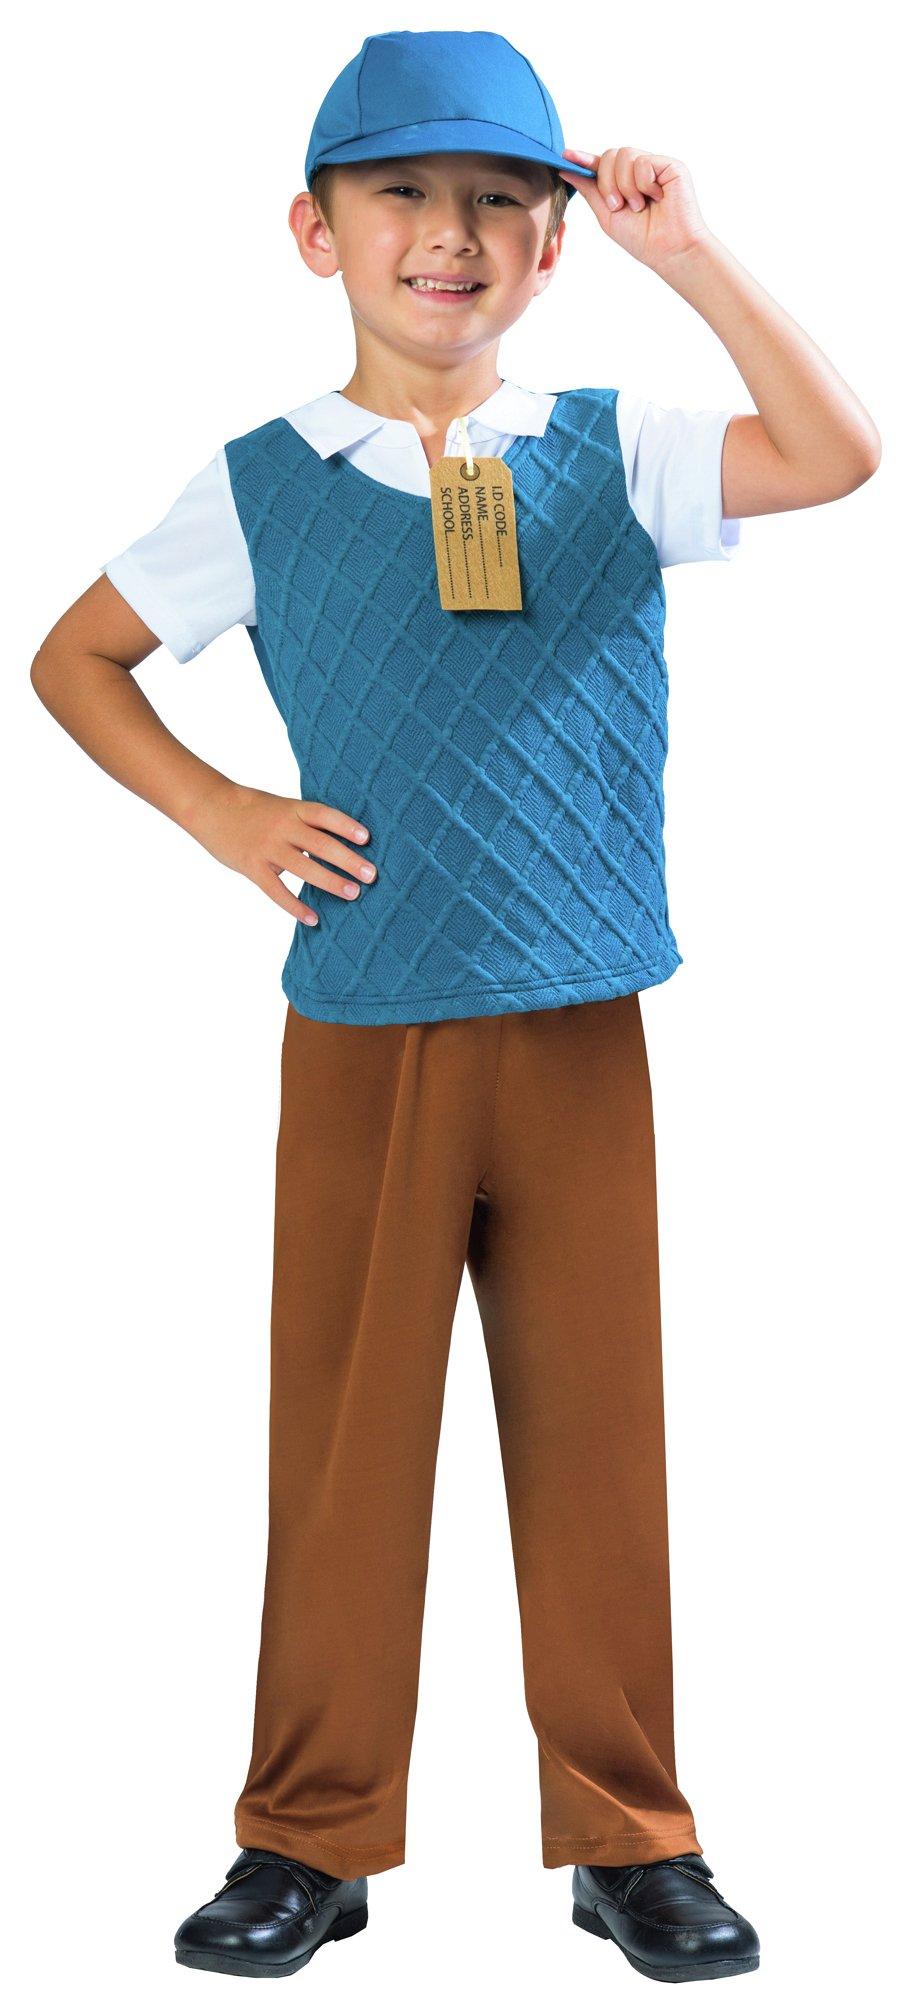 Image of Amscan Evacuee Boy Costume - 9 - 10 Years.